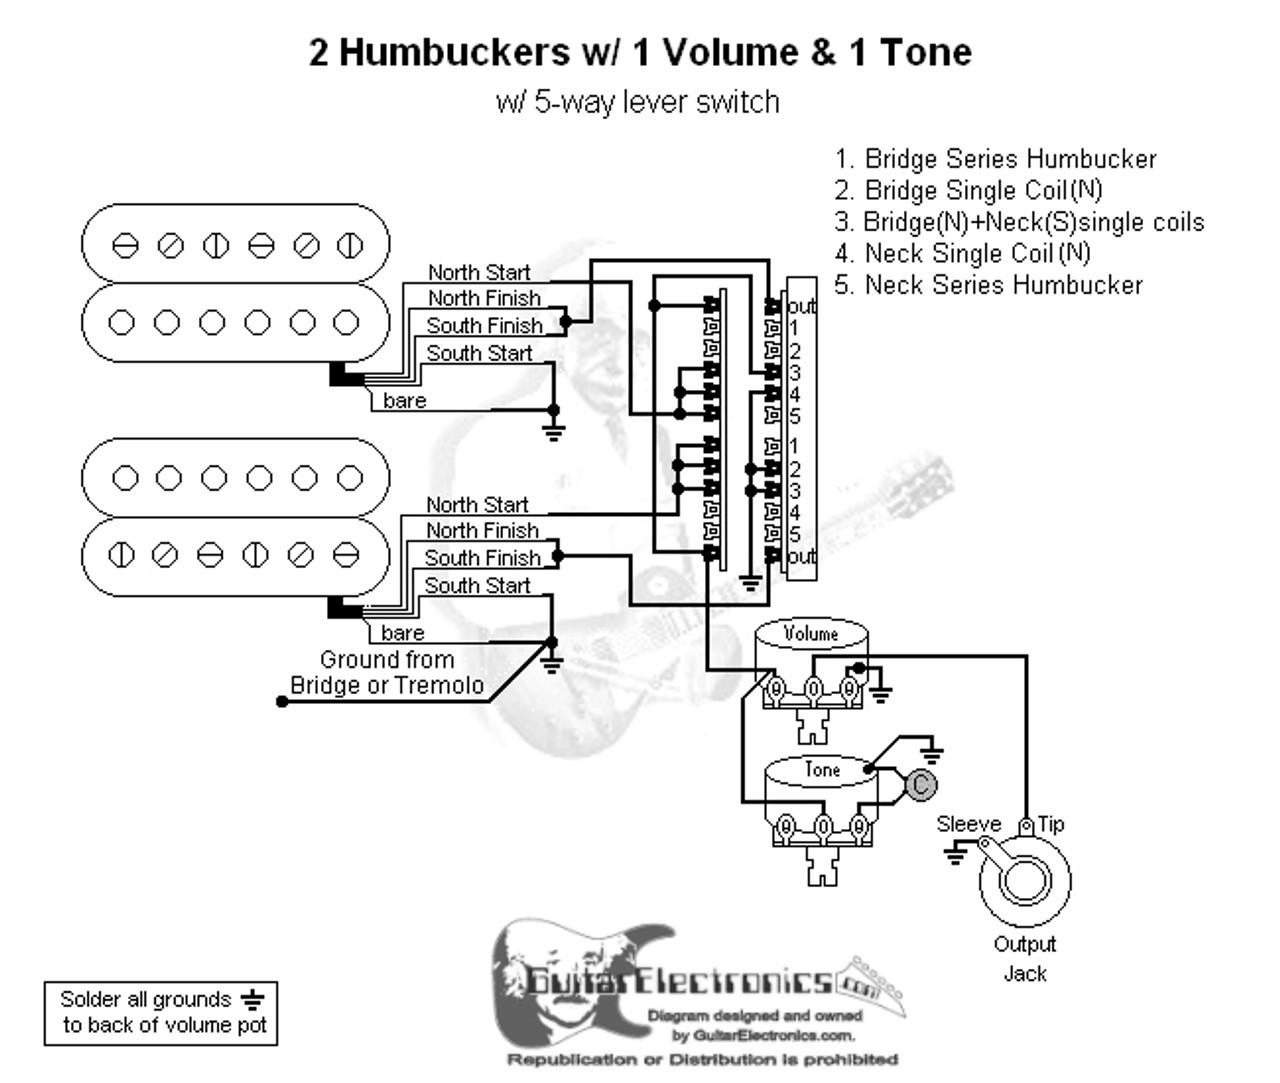 hight resolution of wiring diagram 2 humbuckers 1 volume 1 tone 5 way switch wiring2 humbuckers 5 way lever